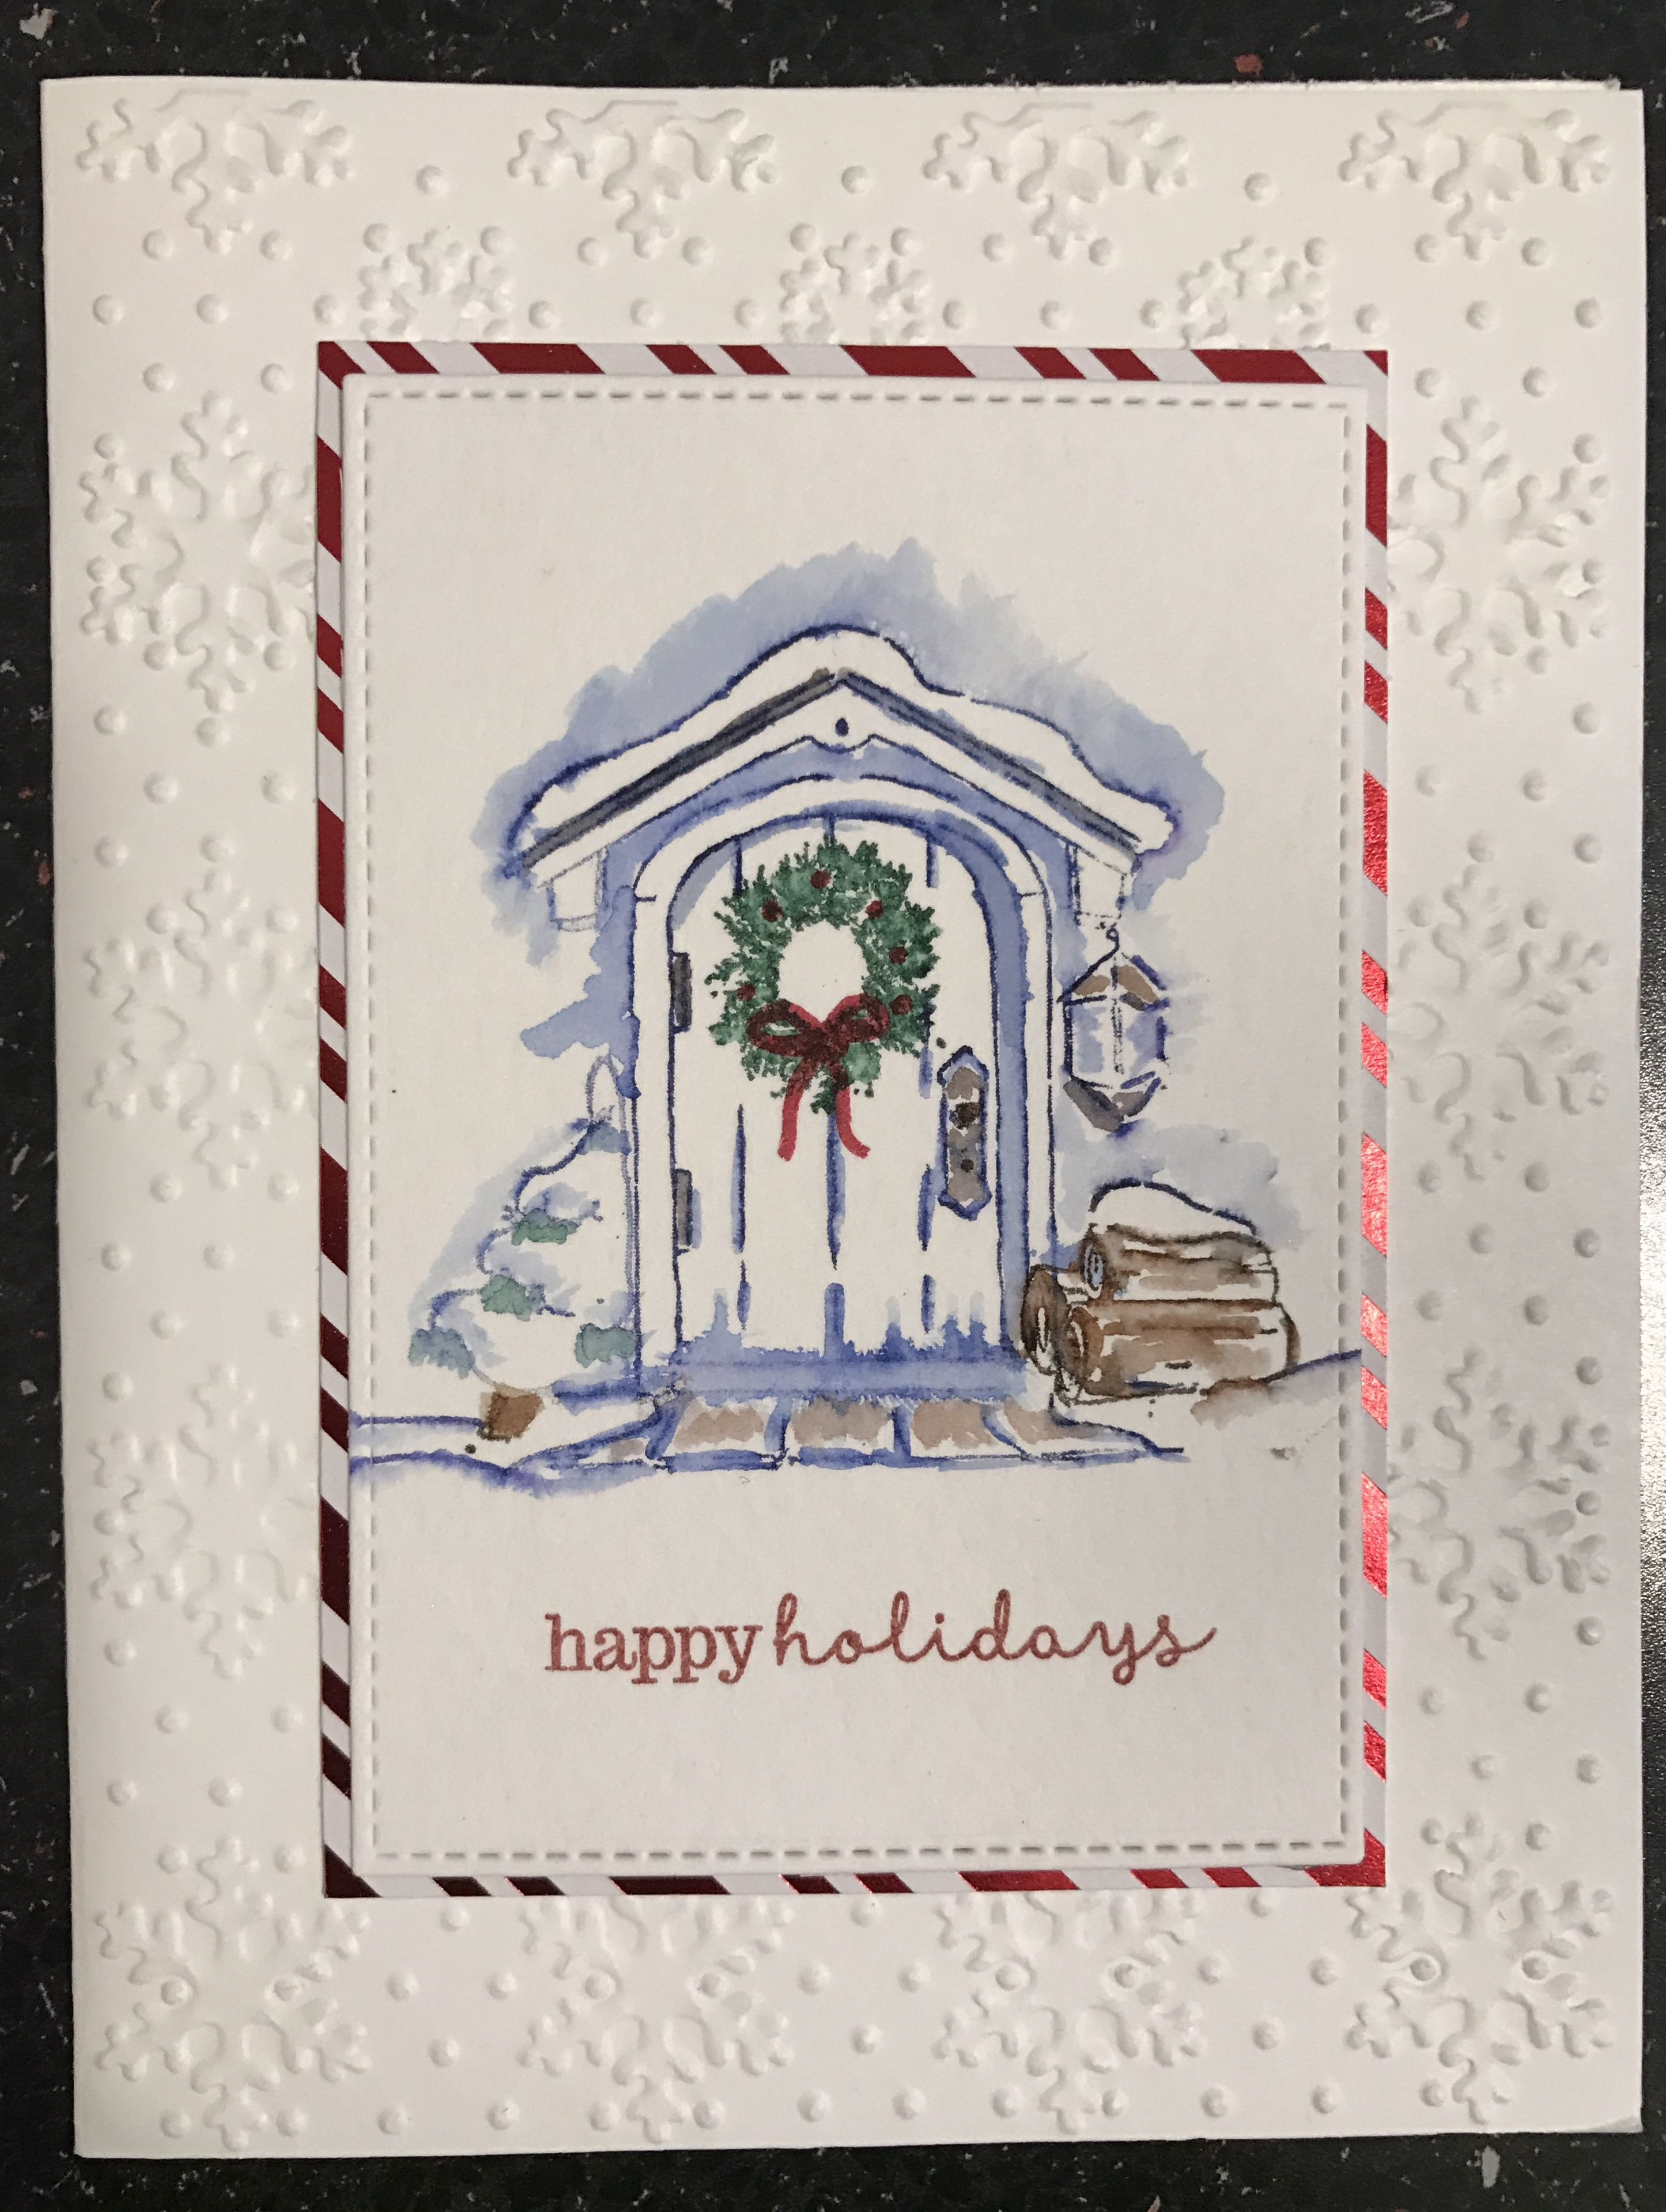 Art Impressions winter holiday card Art Imp videos